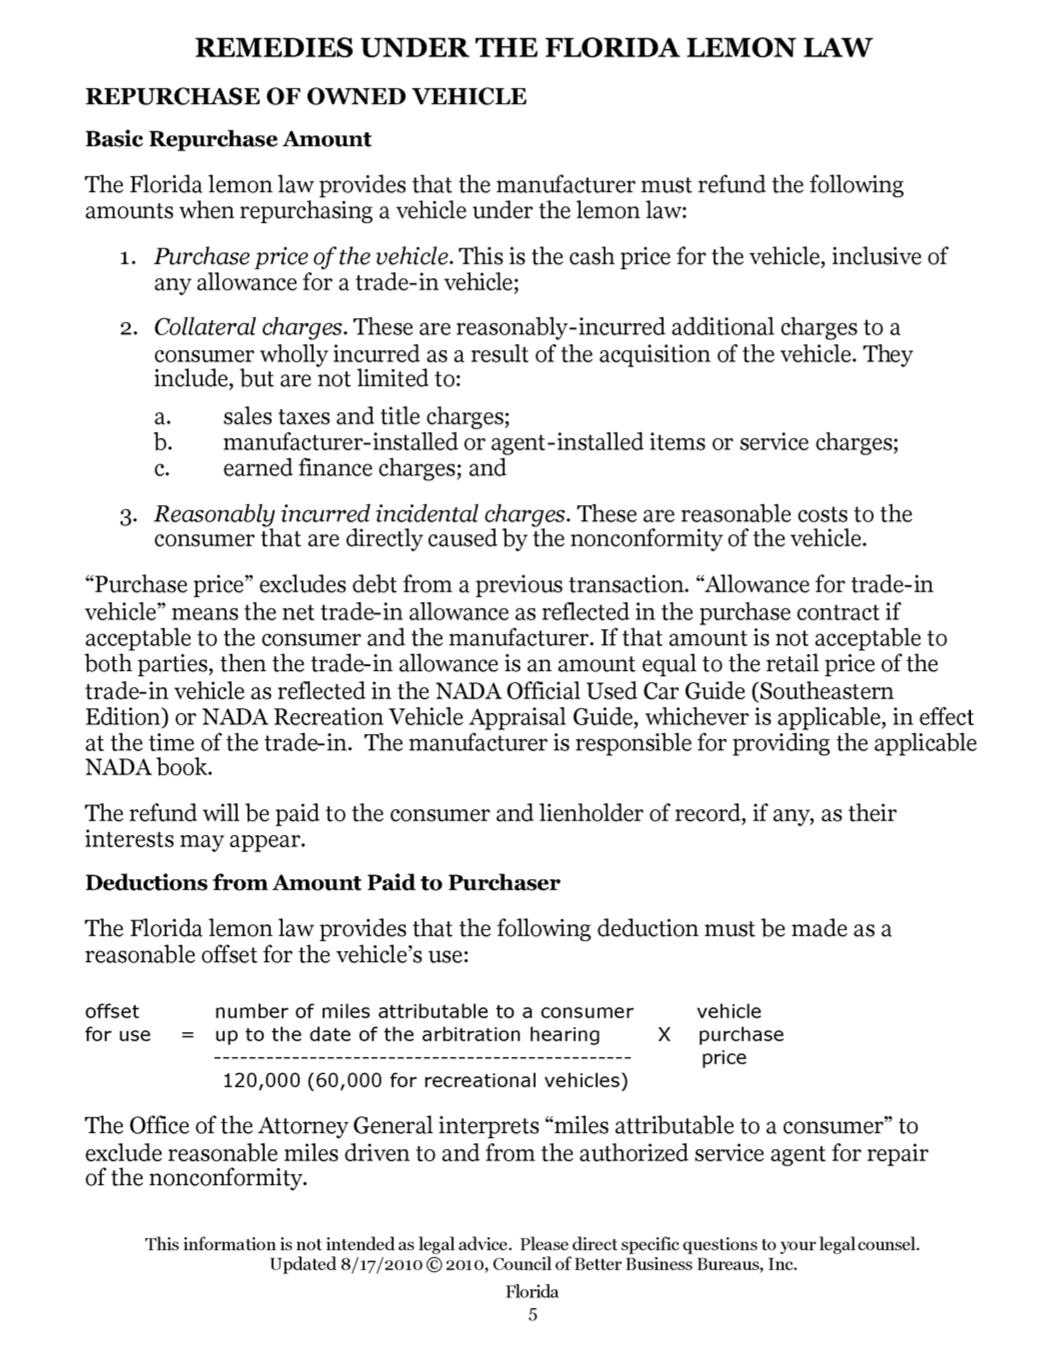 BEWARE using BBB Autoline arbitration to settle Lemon Law